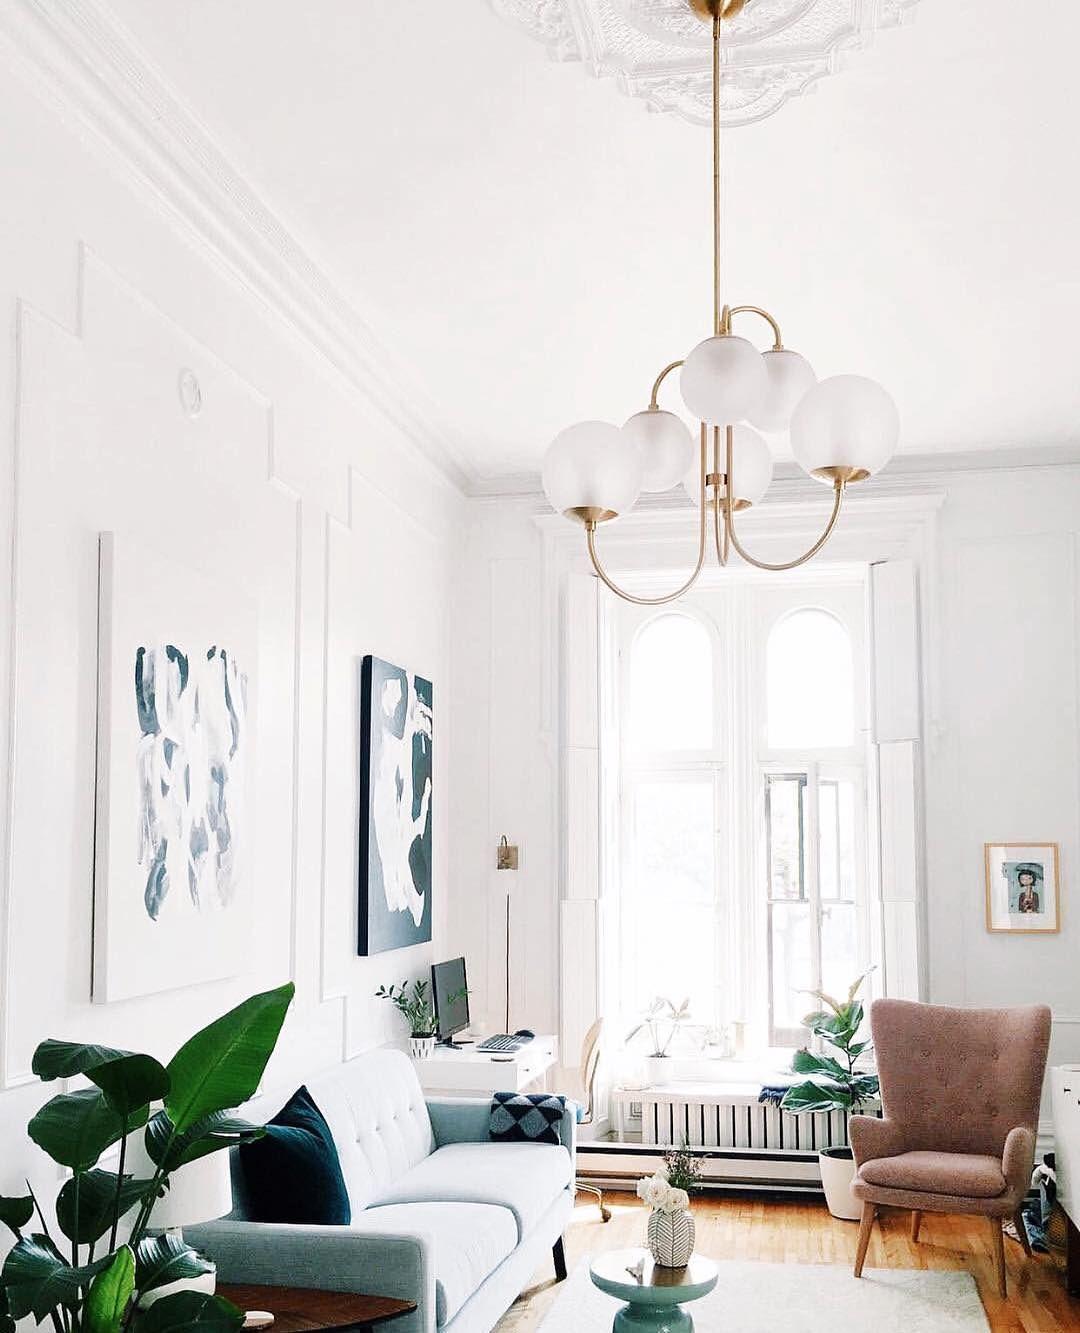 Get Home Design Ideas: Bloglovin' Home On Instagram: When It Still Feels Like